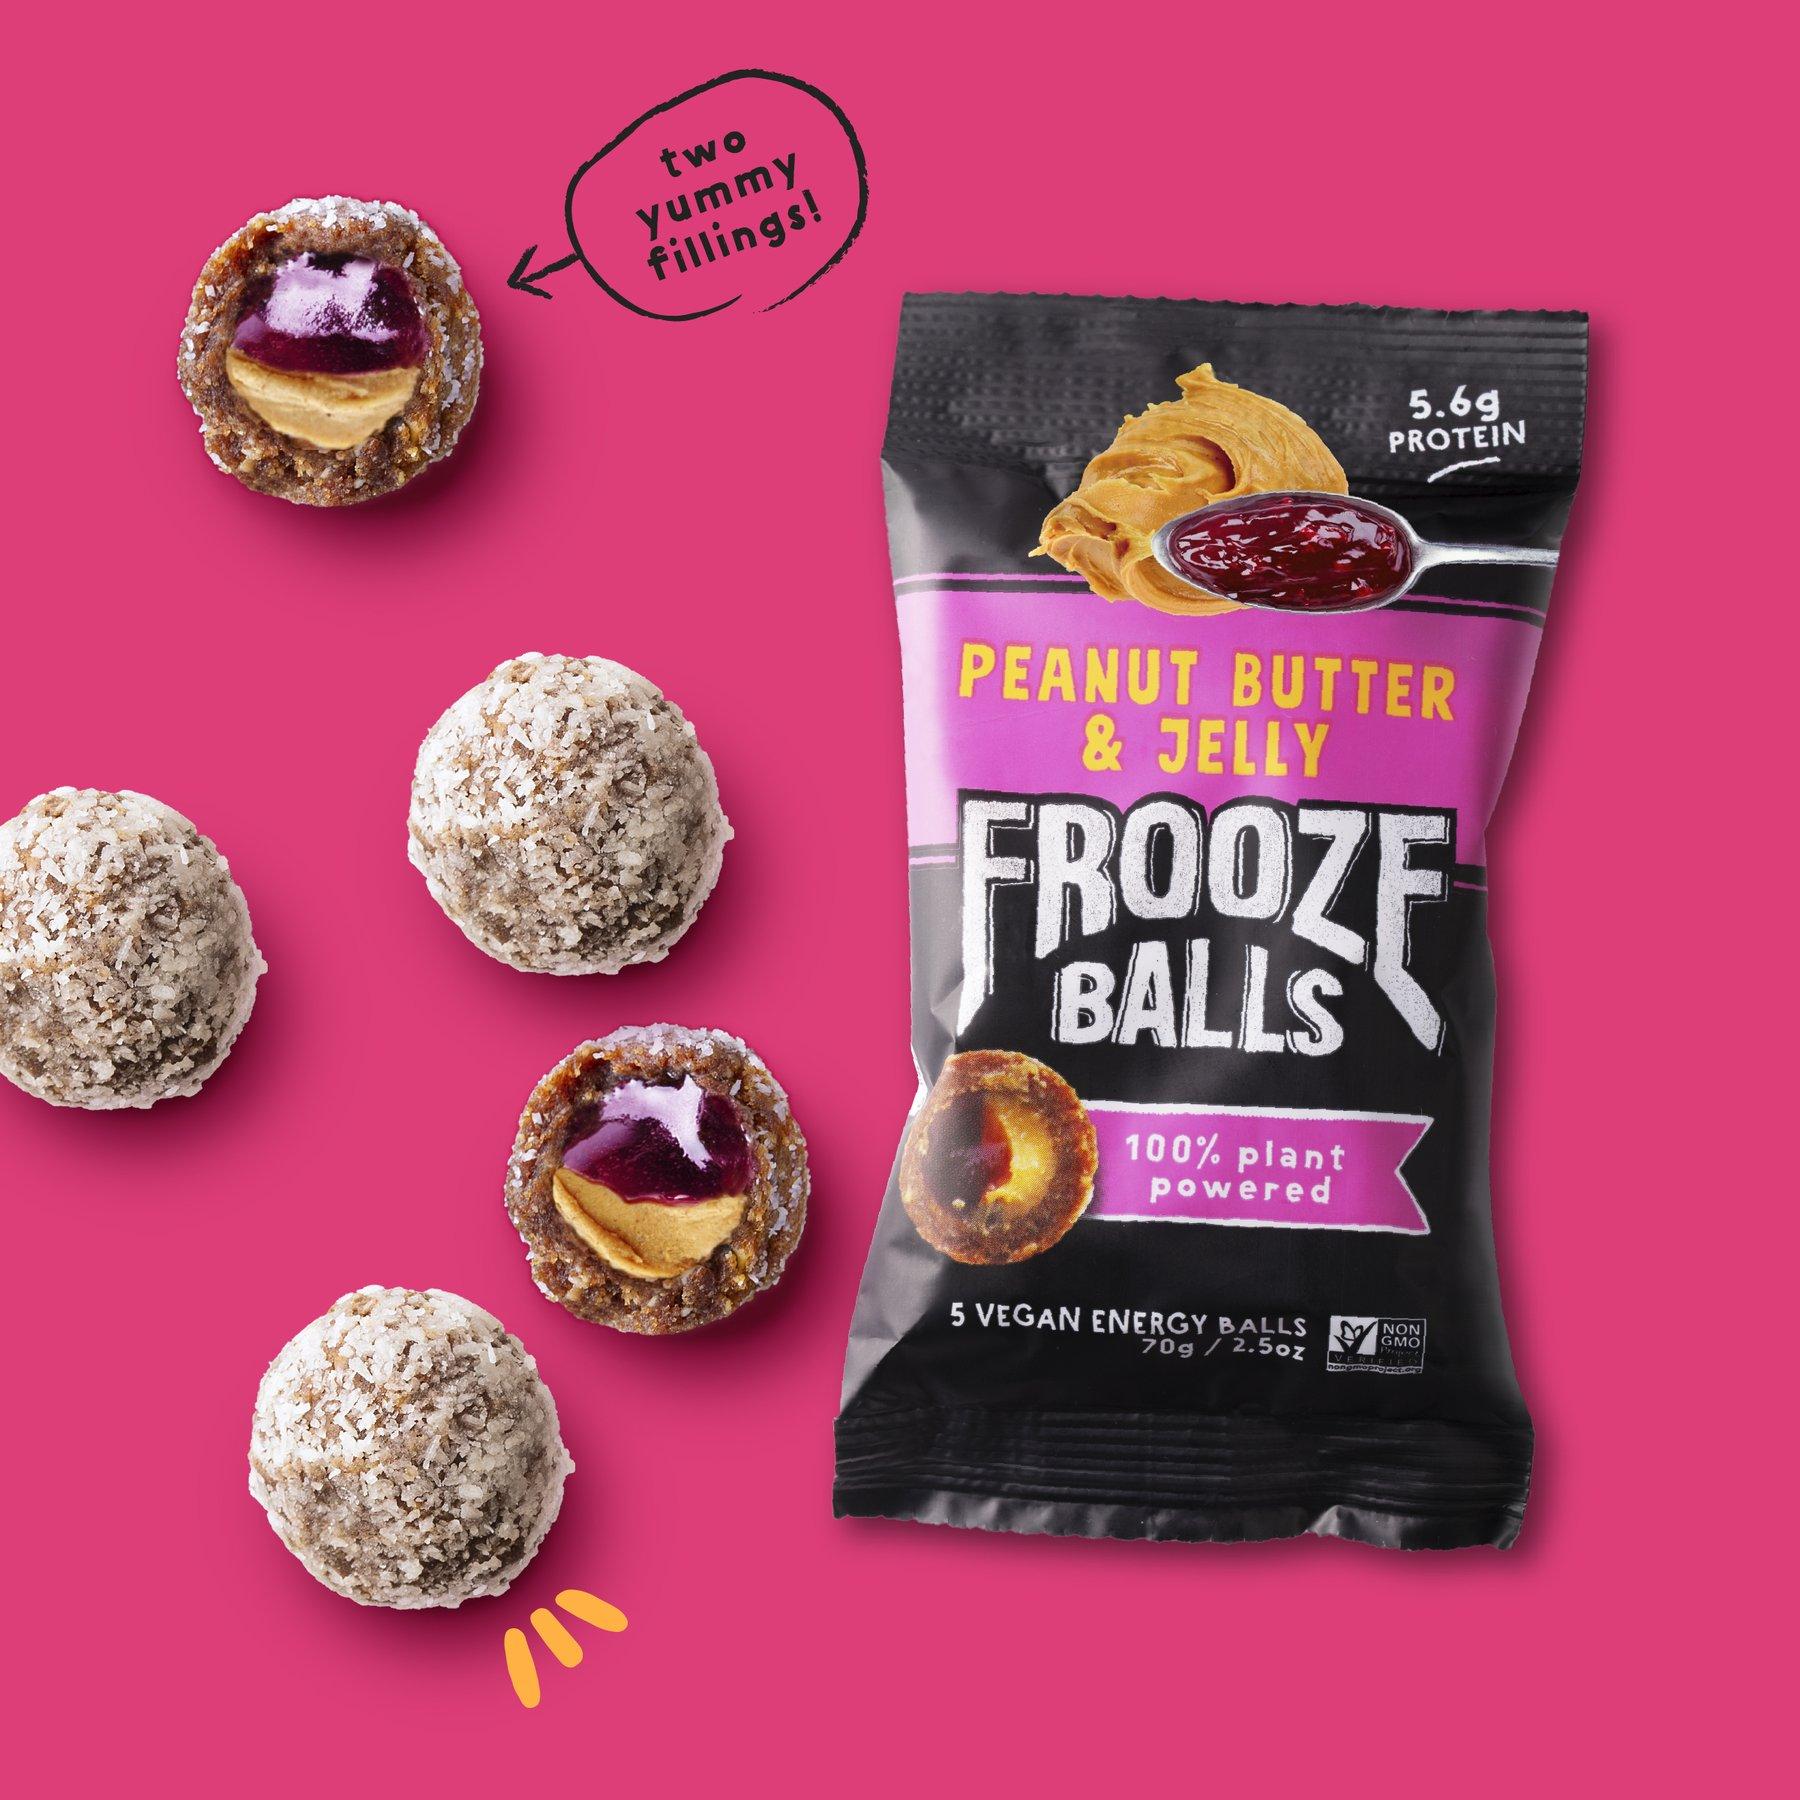 23-Frooze-Balls-Post-2400x2400_1800x1800